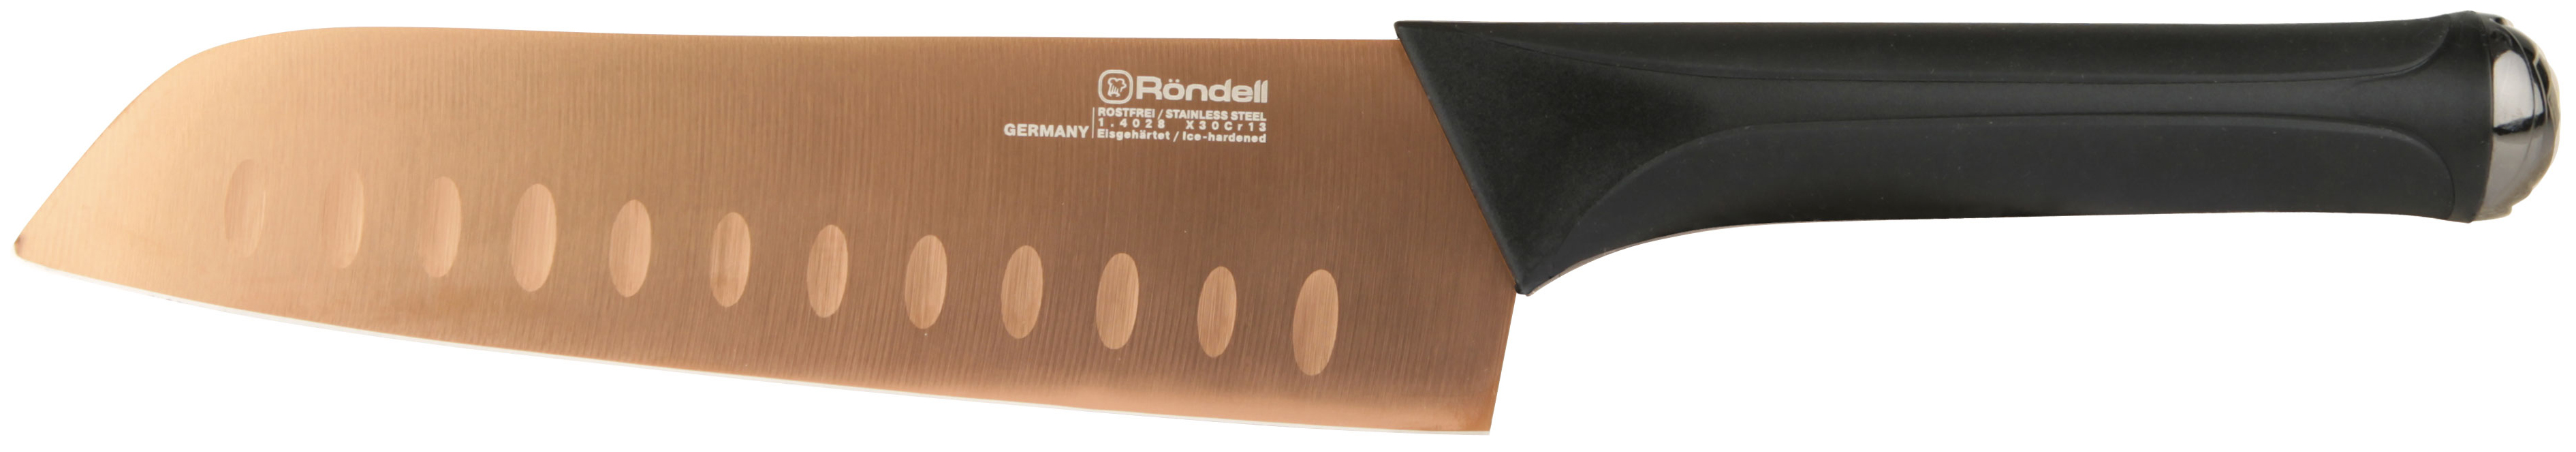 Нож кухонный Röndell RD-692 18 см от Rondell